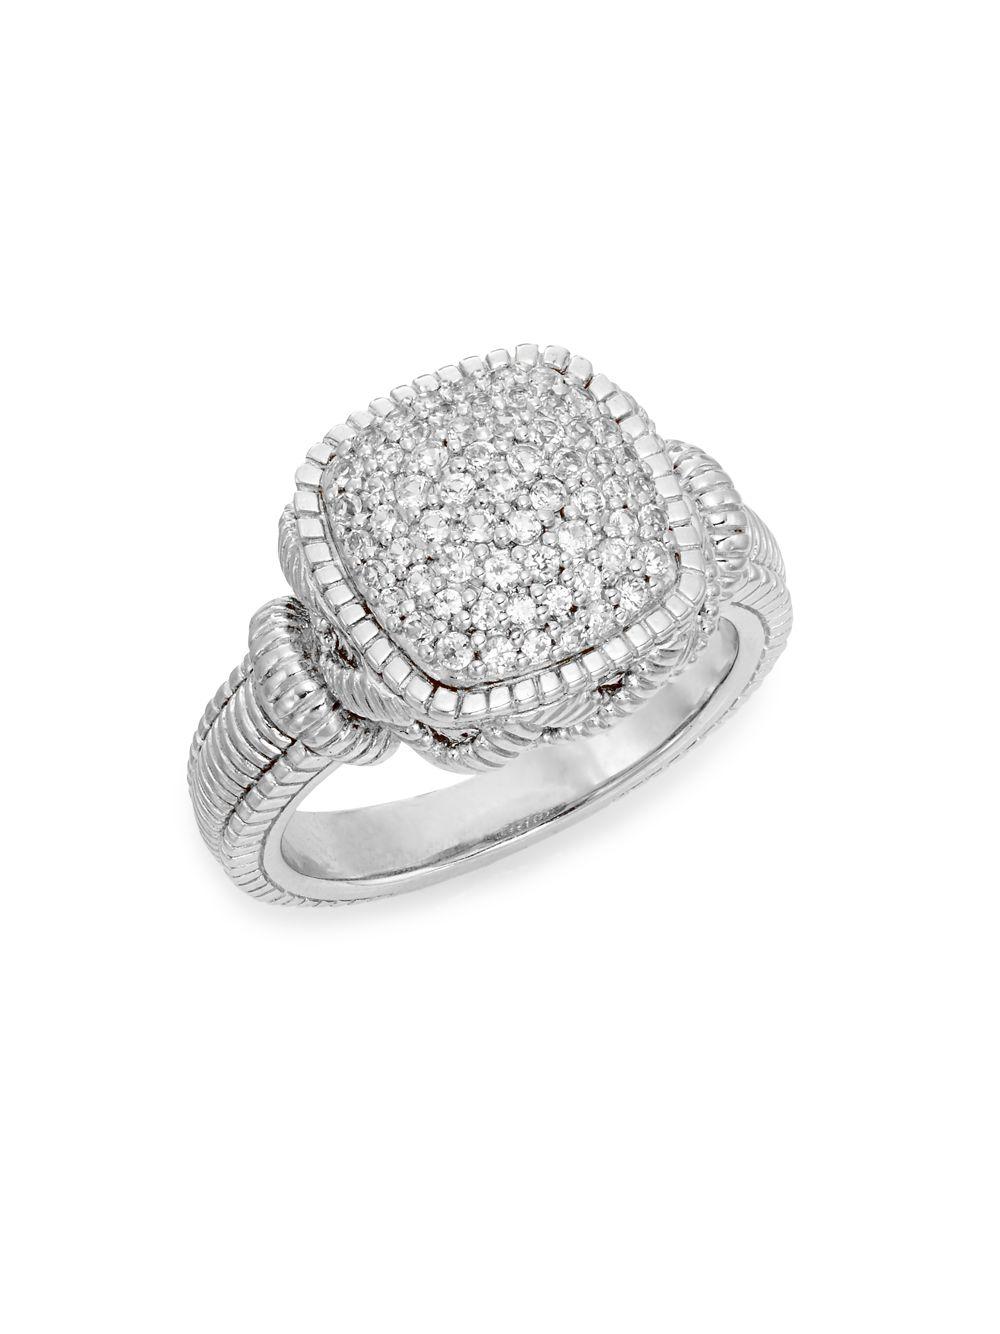 MyriamSOS Square Eternity Ring 3 - K 1/2 u9PCC1Smfp